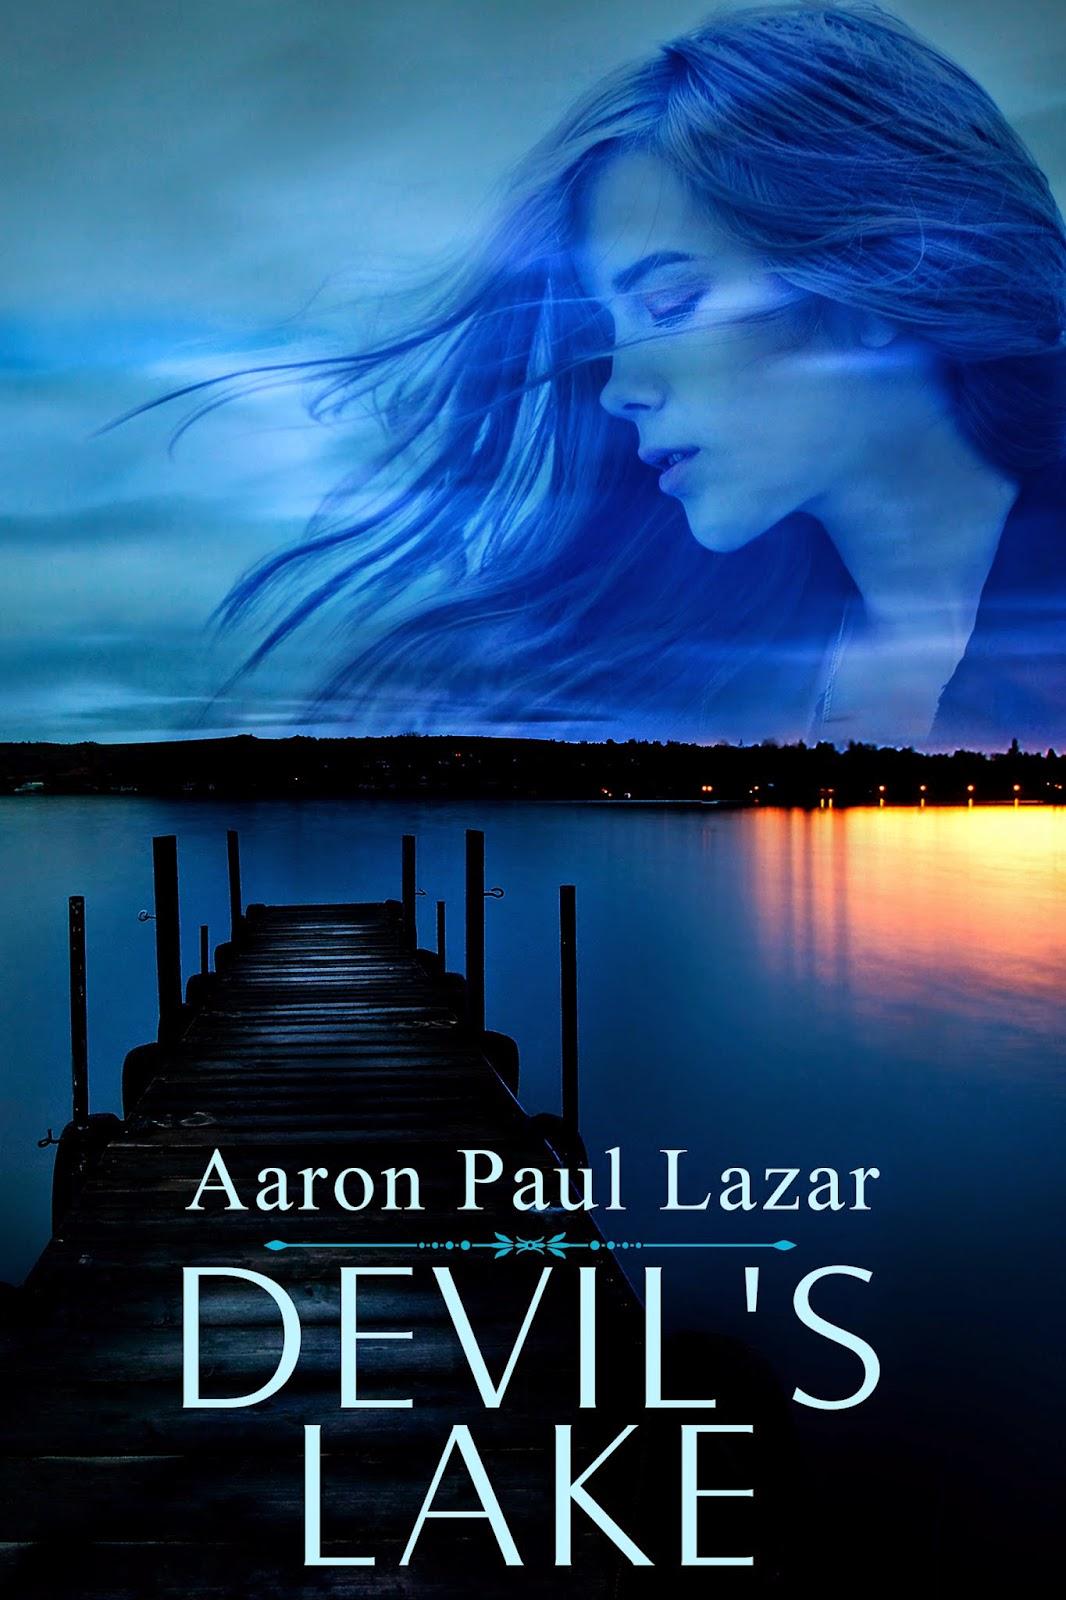 http://www.amazon.com/Devils-Lake-Aaron-Paul-Lazar-ebook/dp/B00LNFP8XU/ref=sr_1_1?s=digital-text&ie=UTF8&qid=1406900868&sr=1-1&keywords=devil%27s+lake